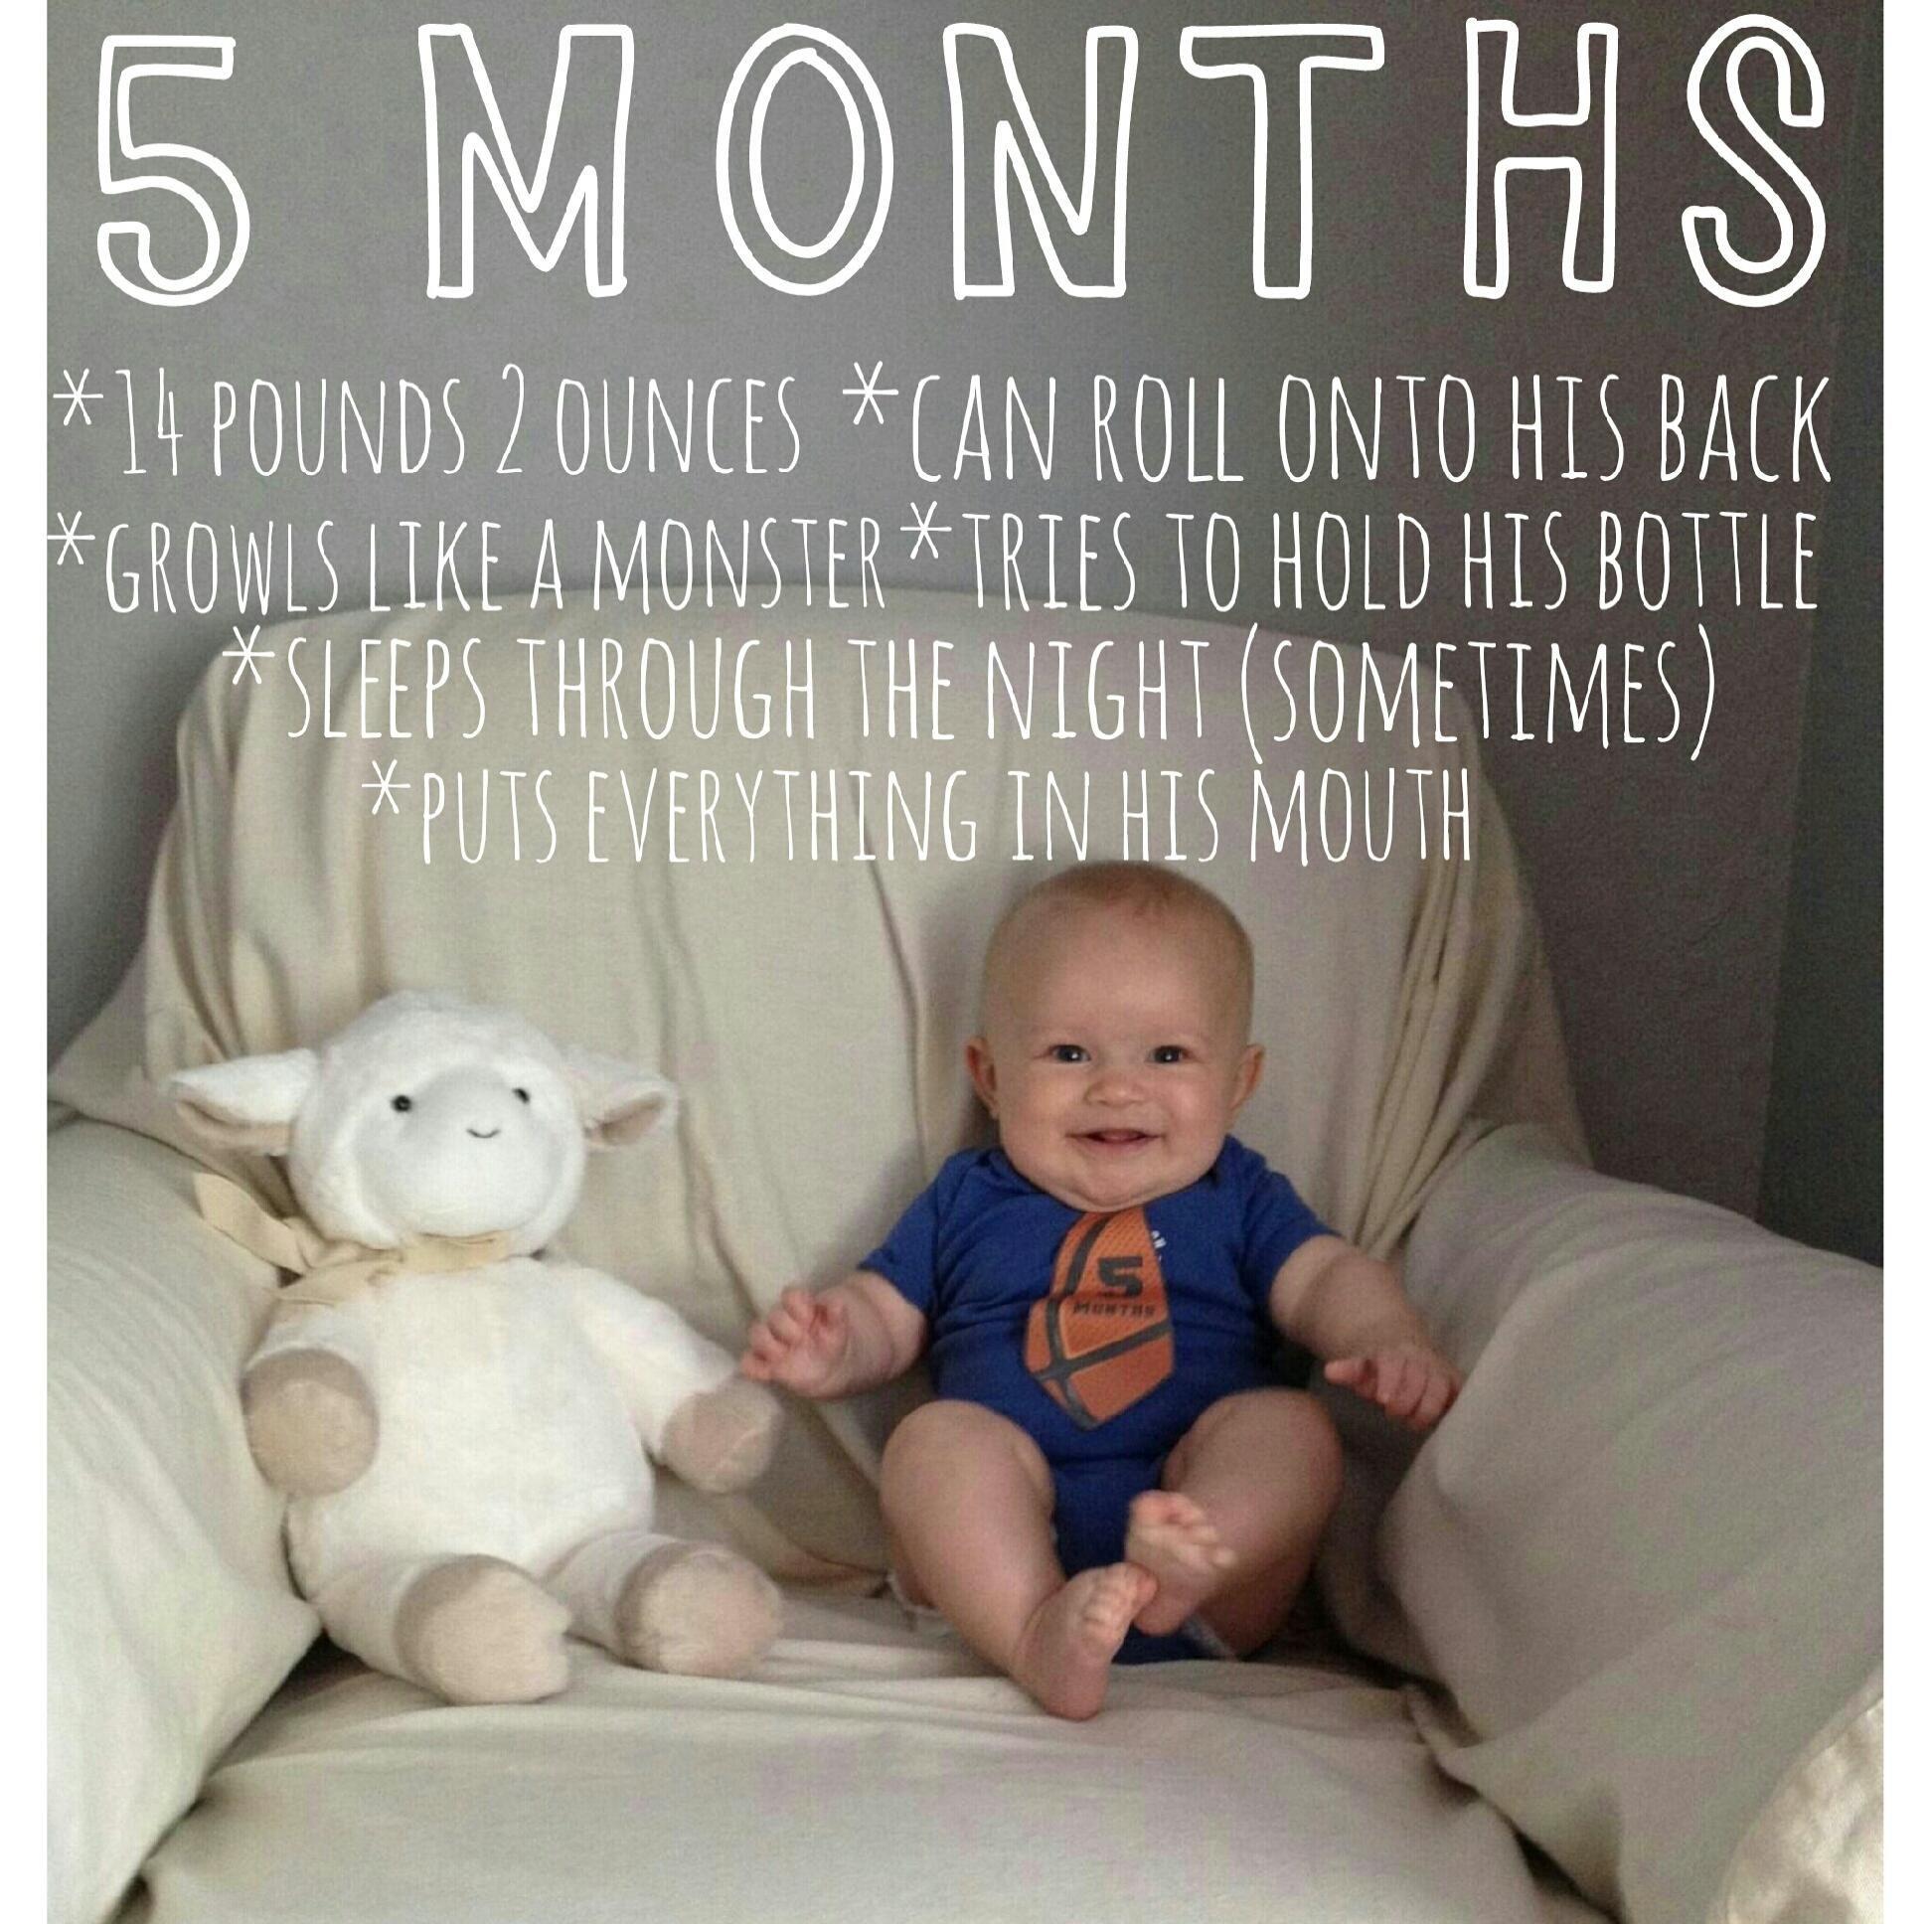 Baby monthly picture 5 months old Jaxen Robert